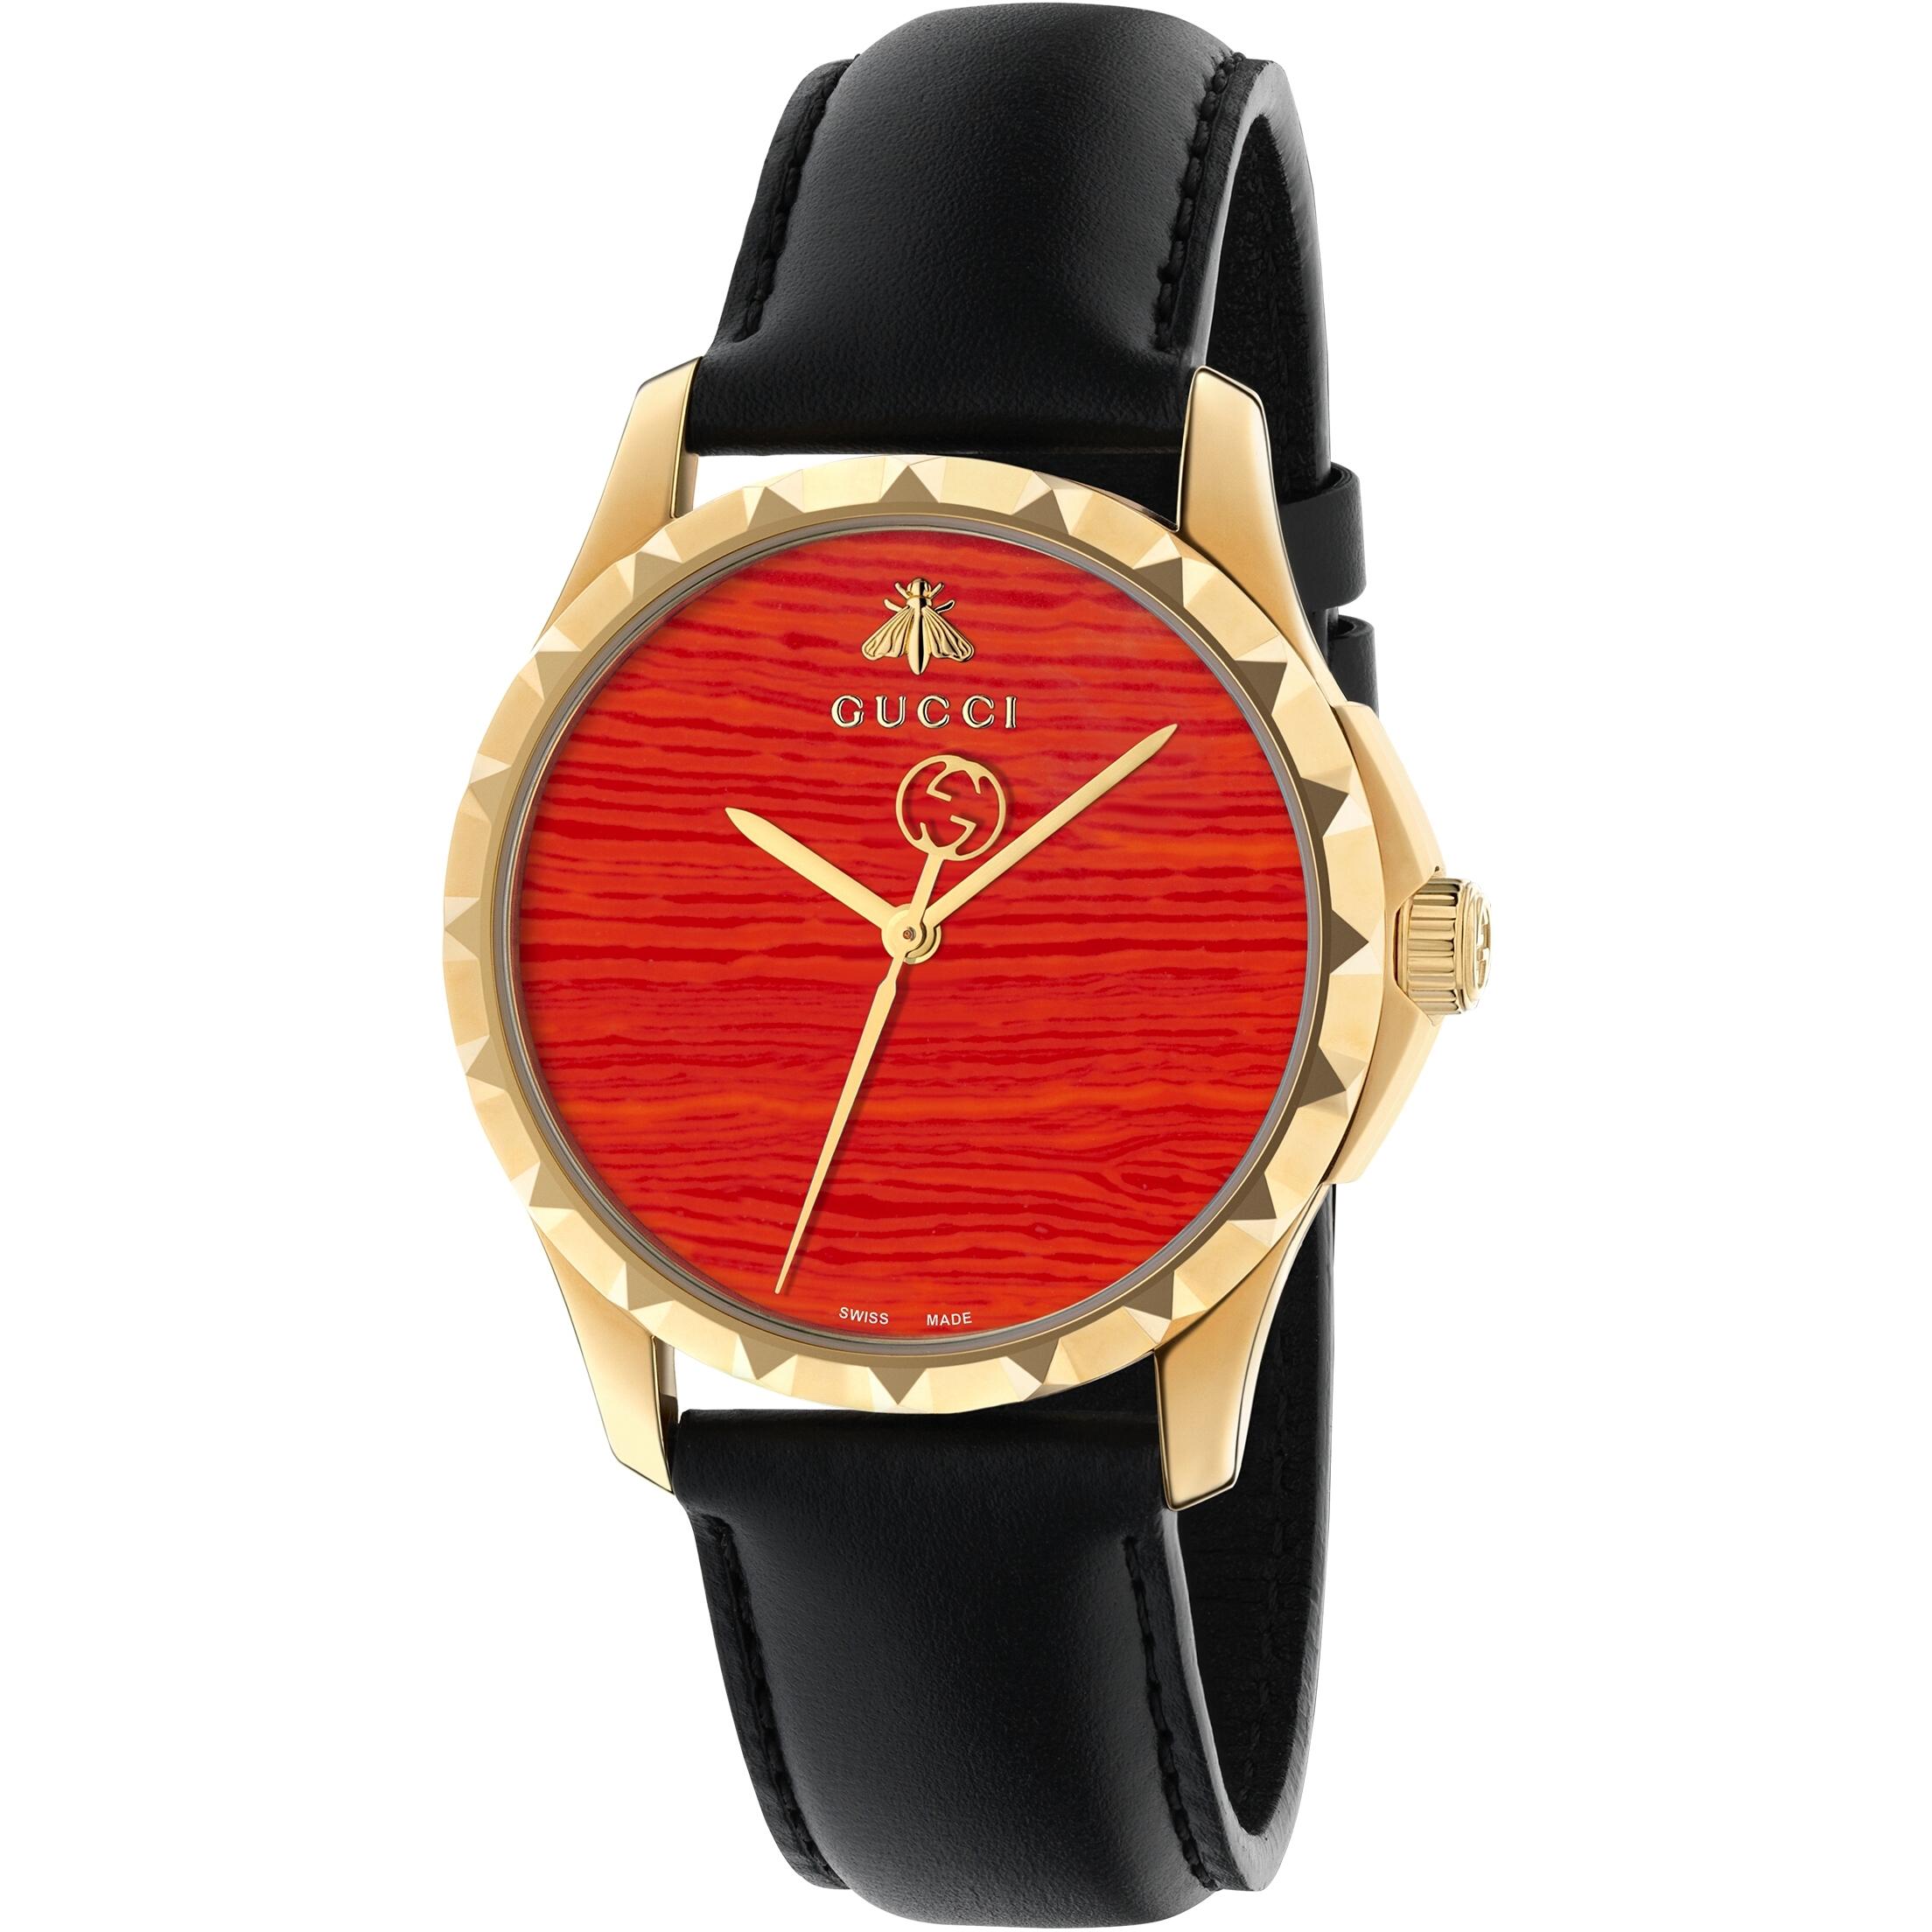 a3e166b5b88 Ladies Gucci Le Marche Des Merveilles Watch (YA126464)